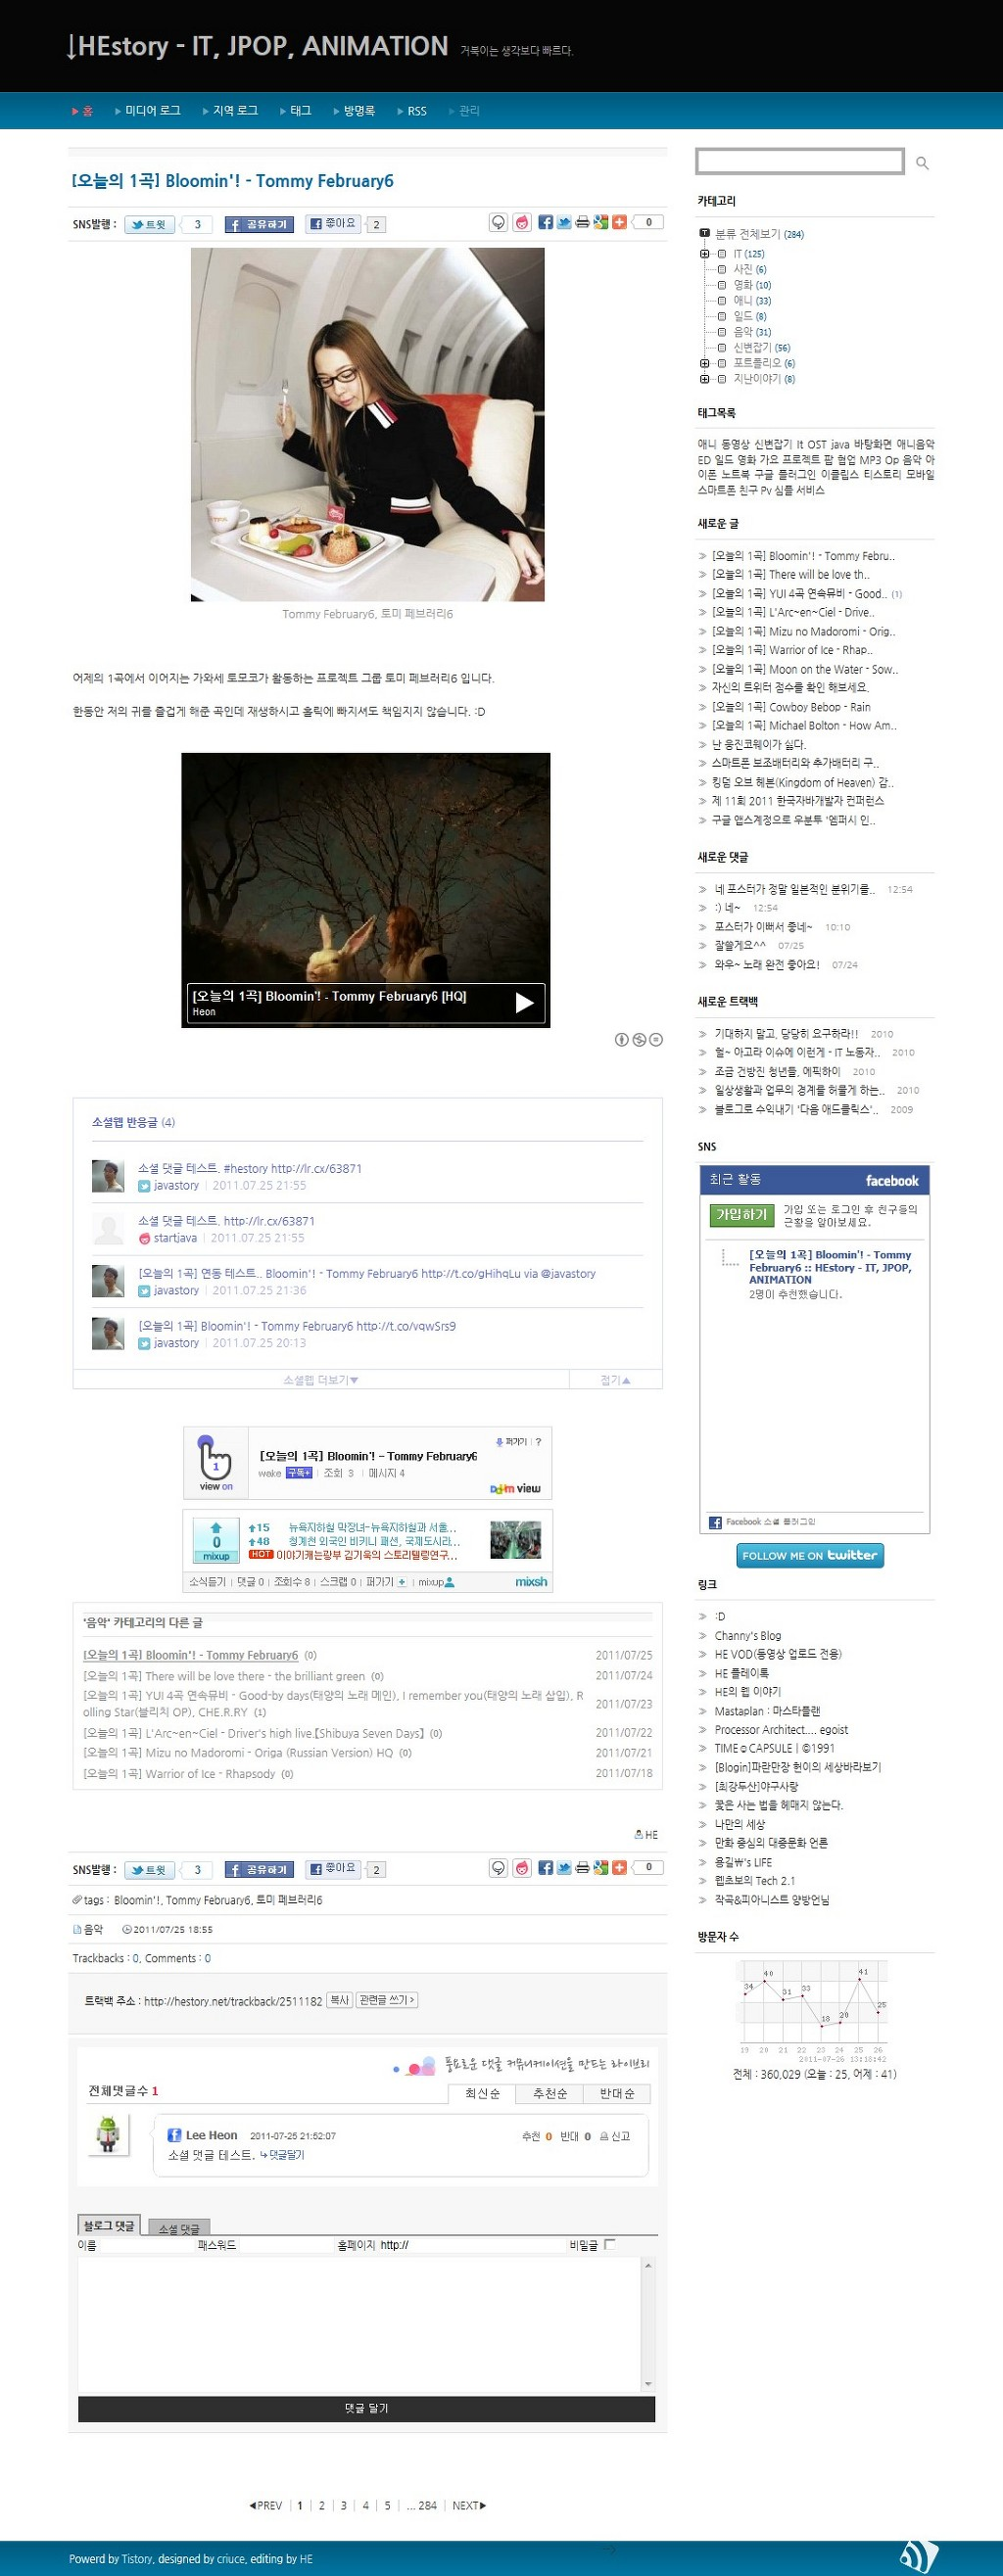 hestory.net 포스트 리뉴얼 (2011.07.26)